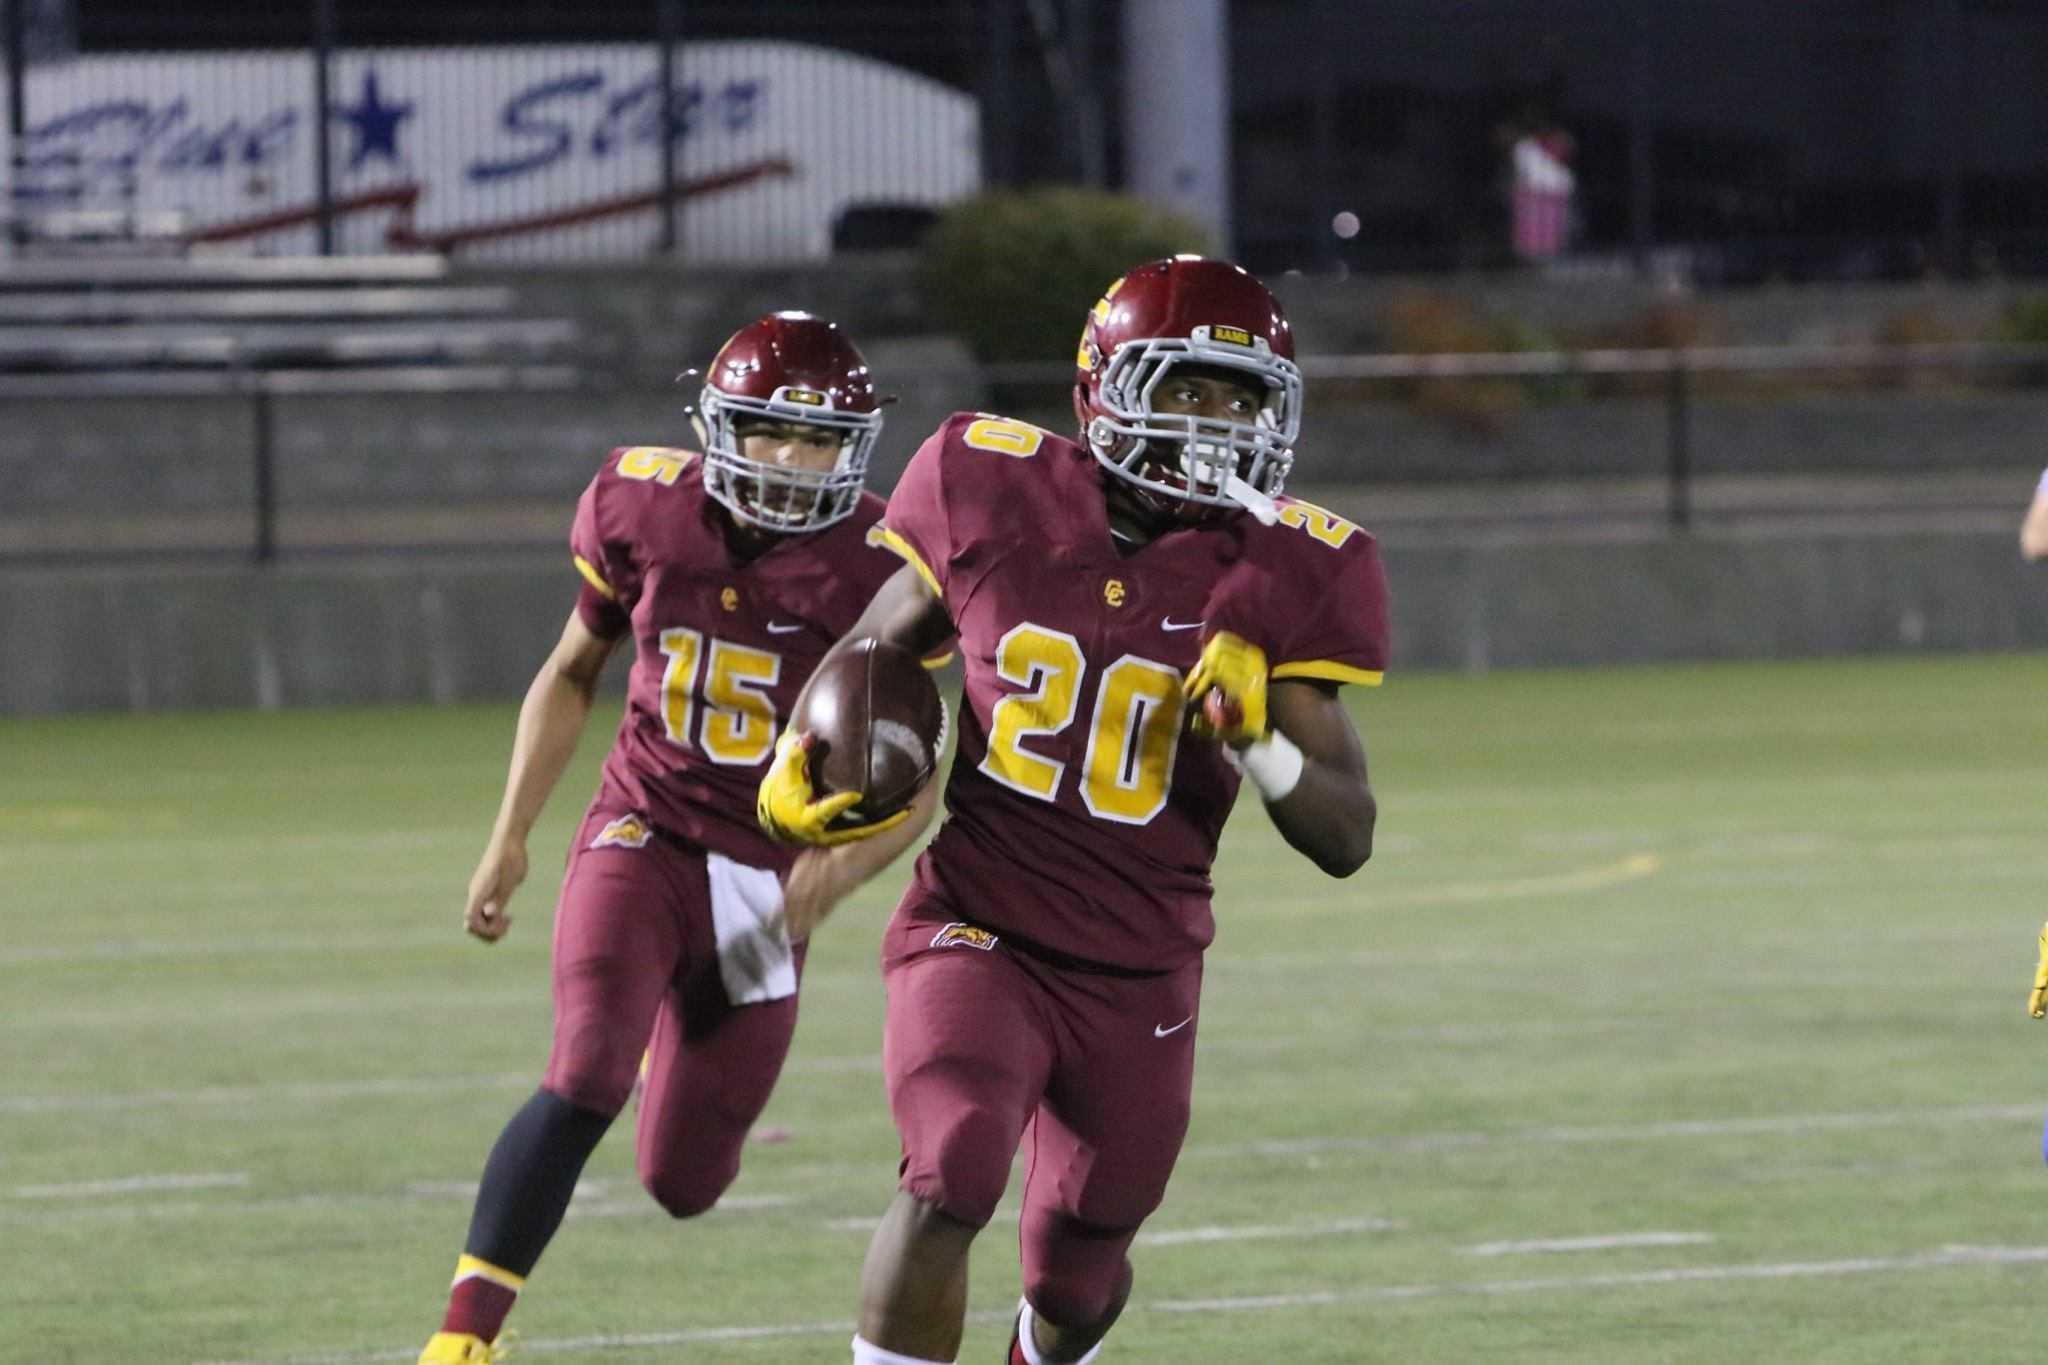 Running back Elijah Elliott (20) and quarterback Cade Knighton (15) will help lead the Rams in 2018. (Photo by Jim Nagae)